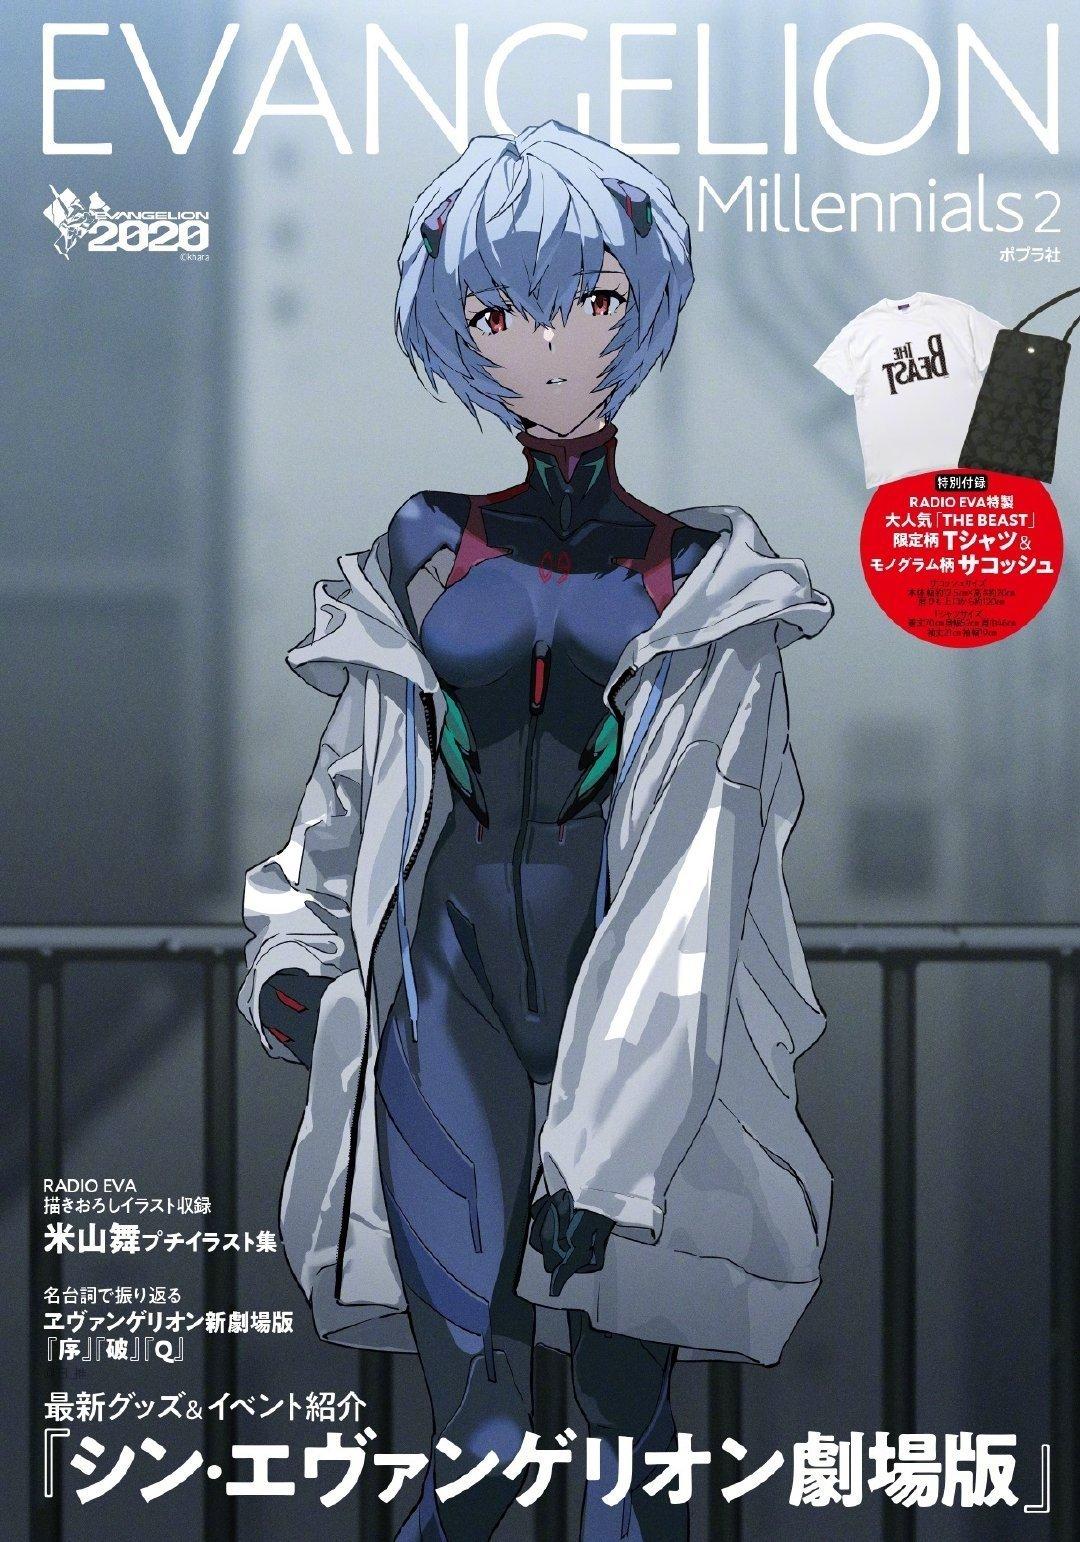 EVA×潮流「EVANGELION Millennials2」将于9月1日发售,封面为绫波丽  - 布丁次元社